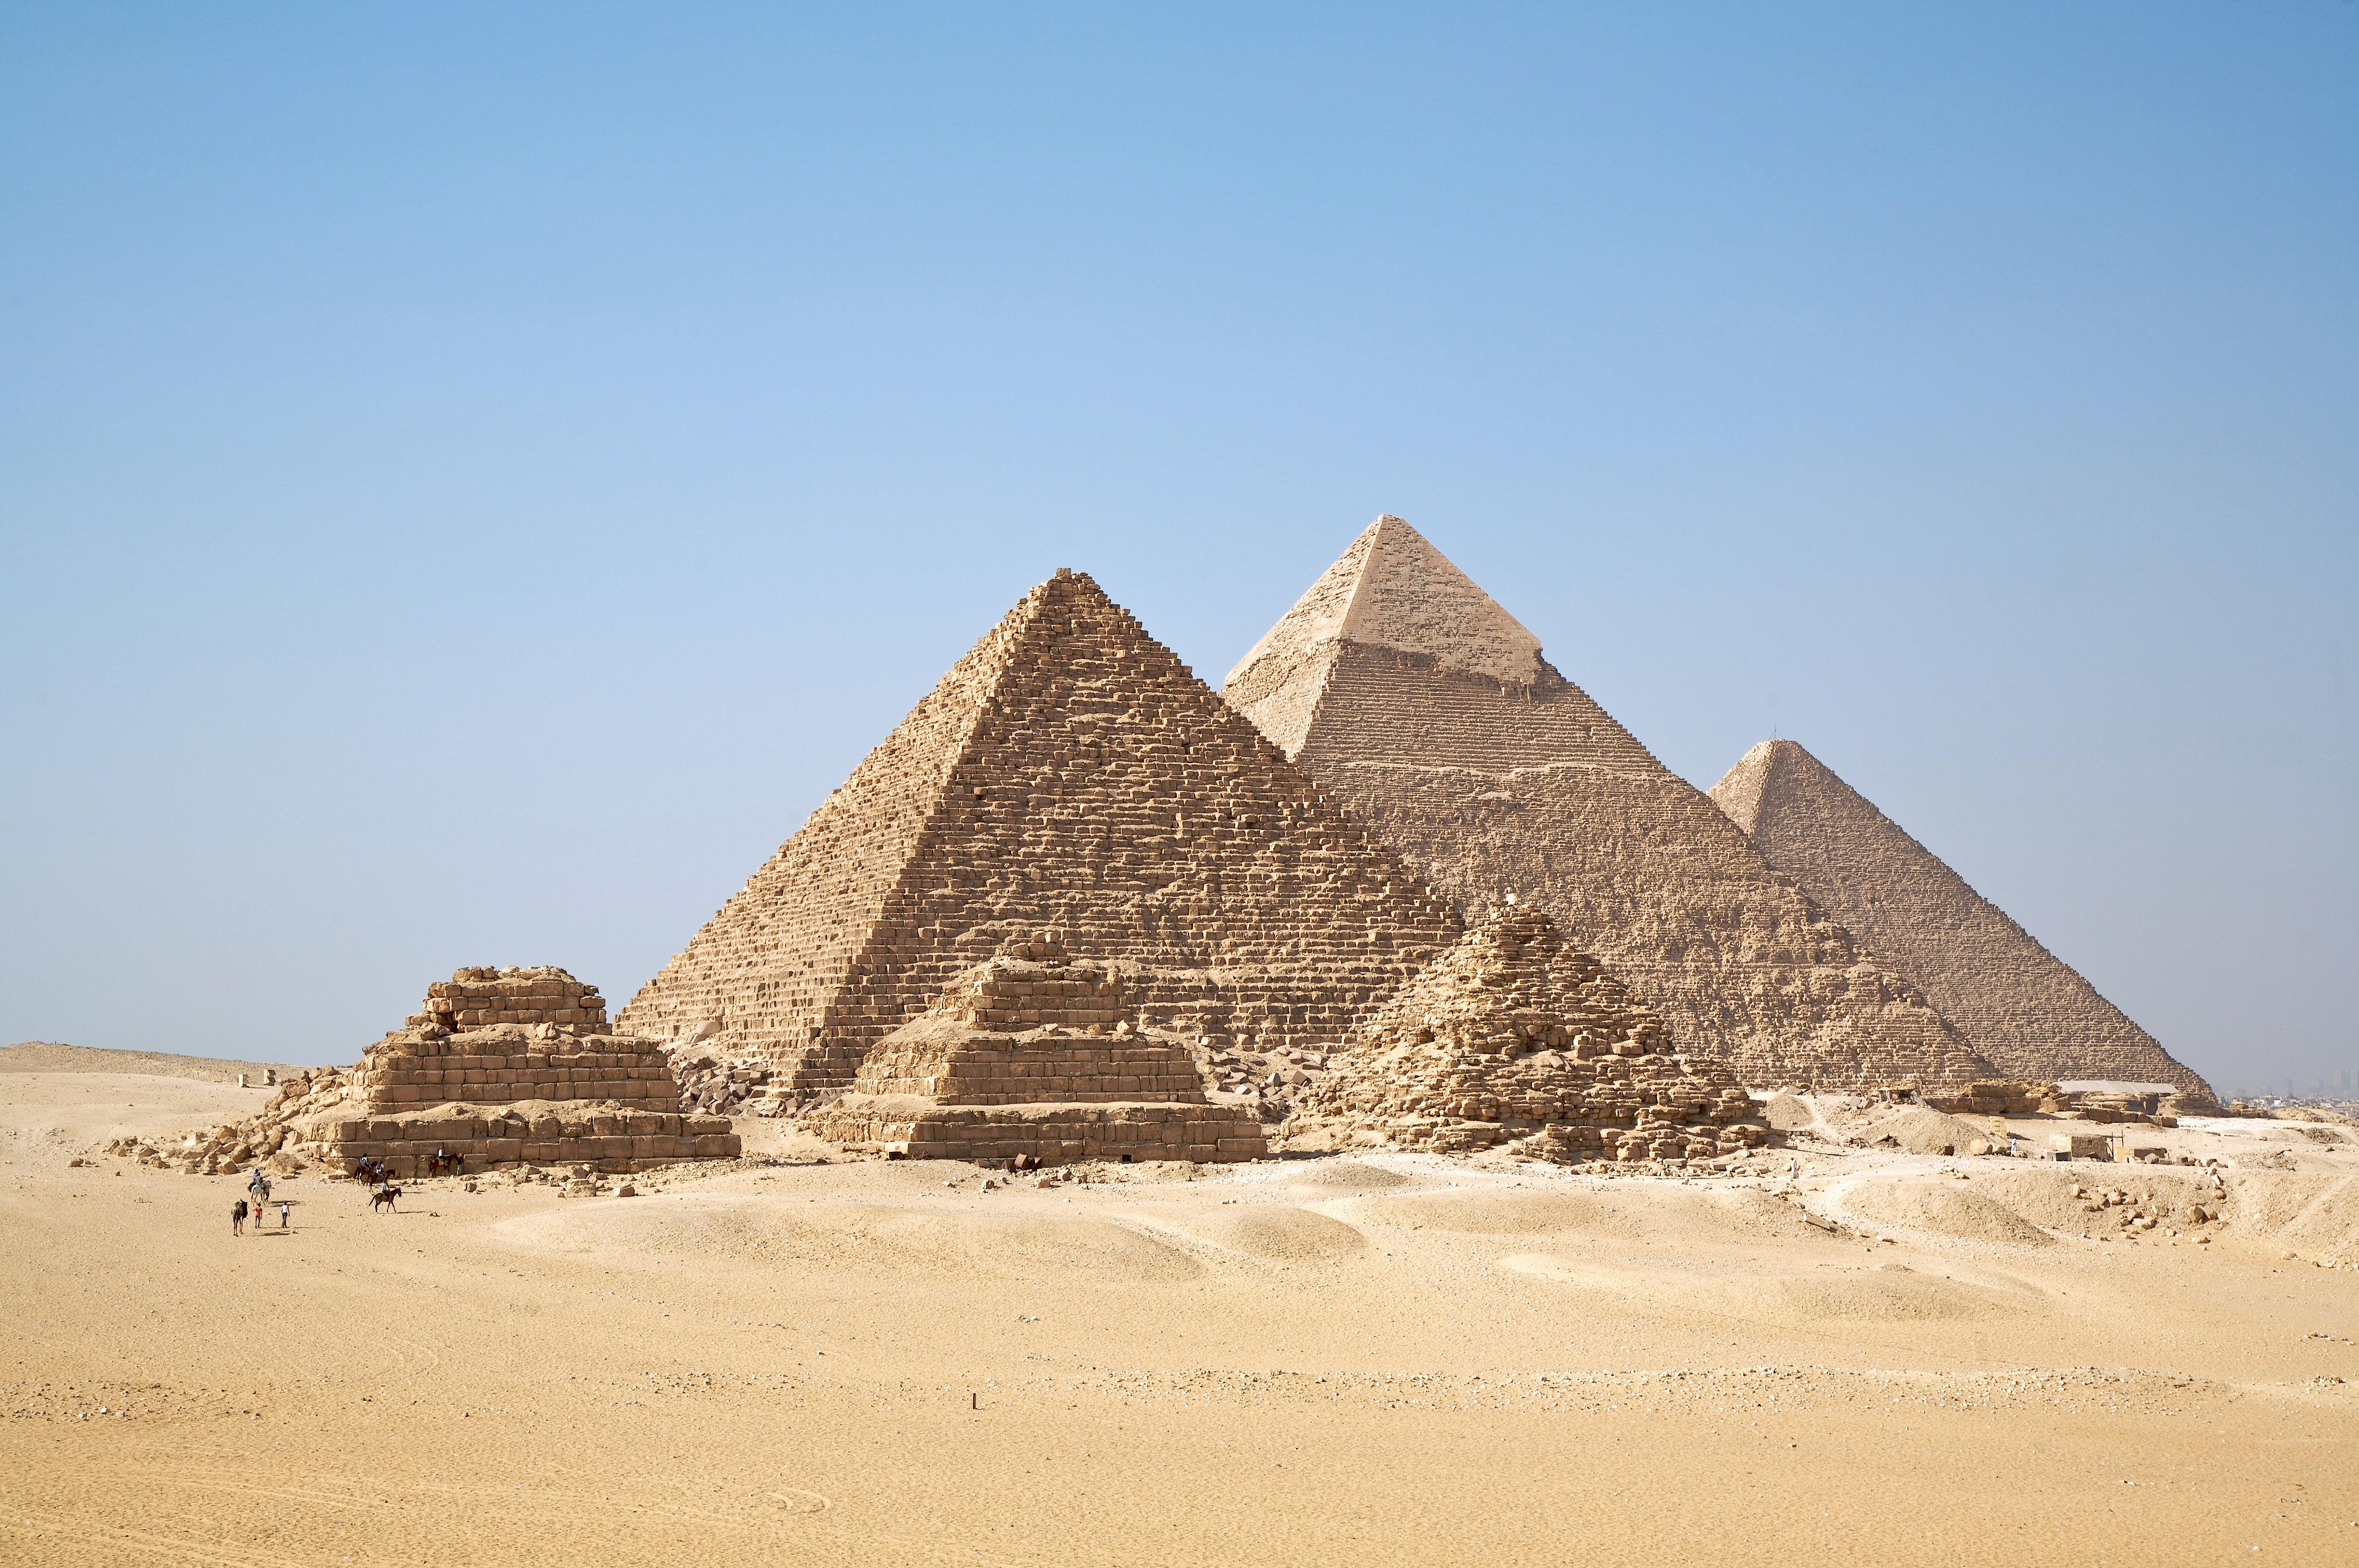 Drawn pyramid egyptian architecture Architecture Egyptian Wikipedia Giza The